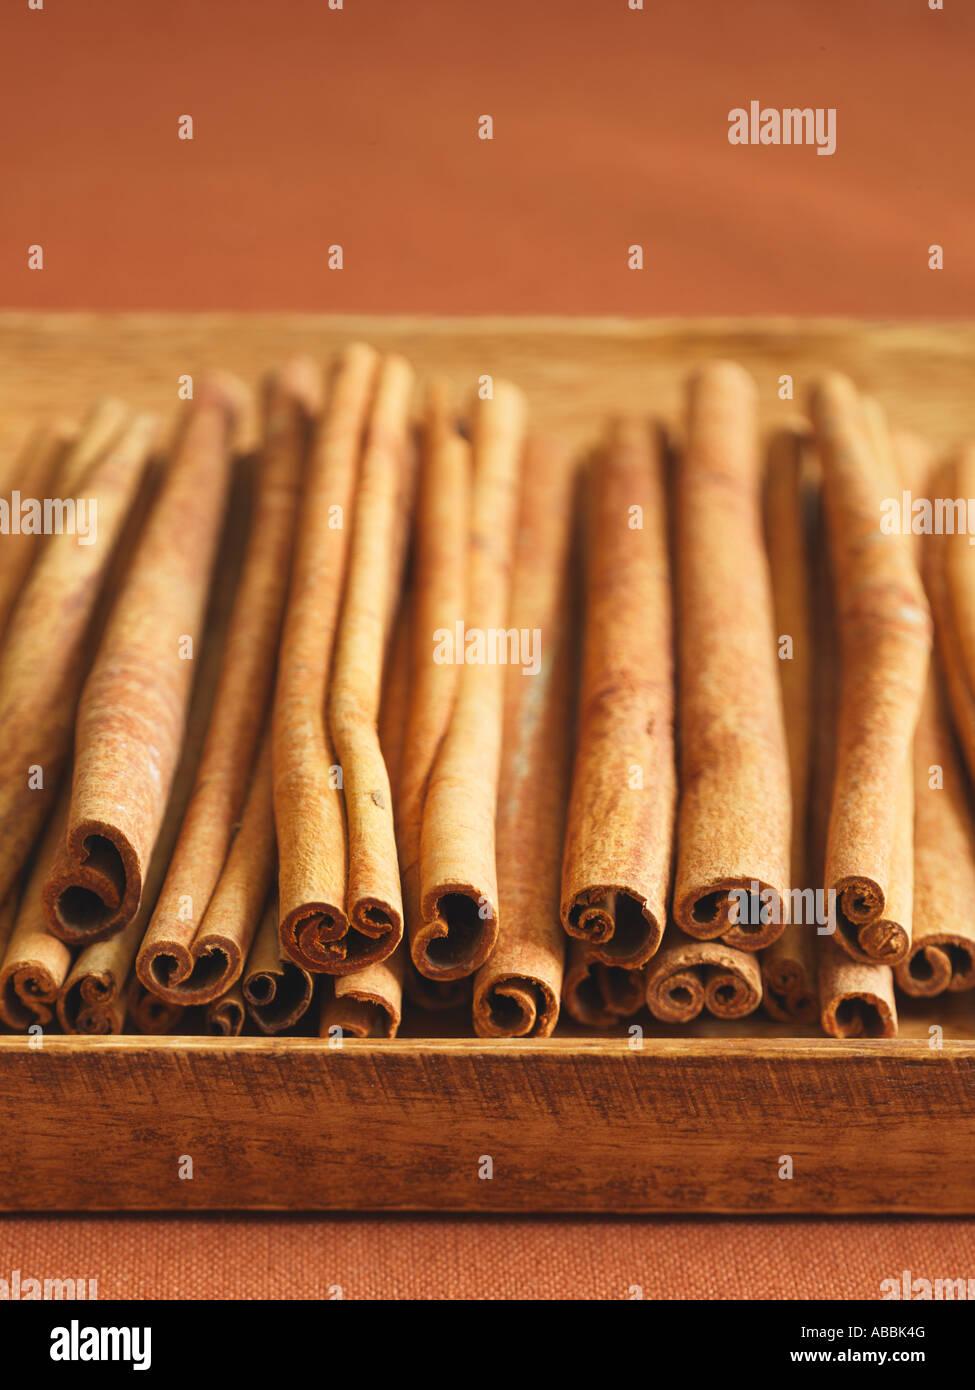 Cinnamon Sticks - Stock Image